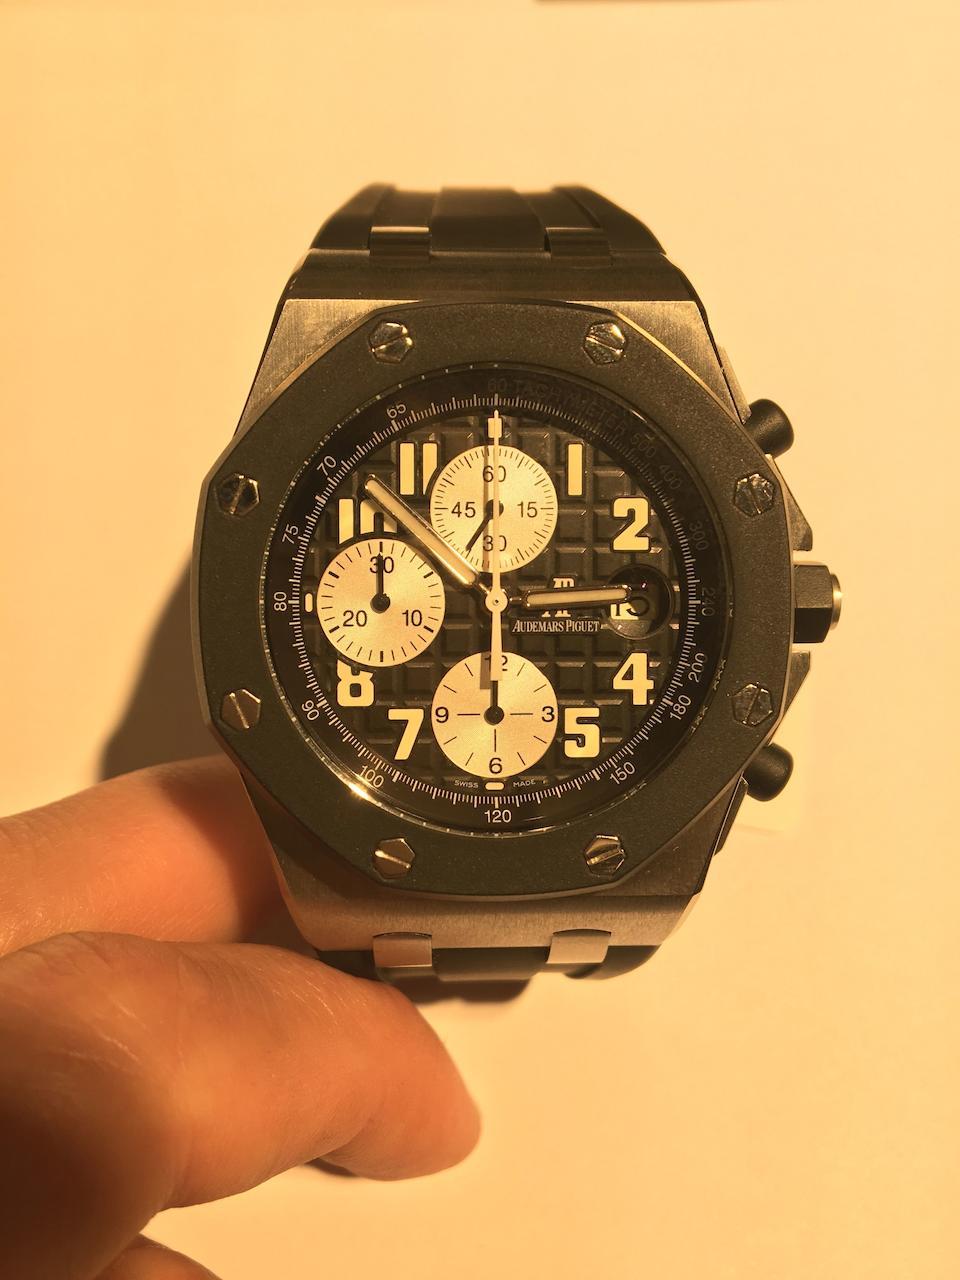 Audemars Piguet. A stainless steel automatic calendar chronograph wristwatch  Royal Oak OffShore, Ref: 25940SK.OO.D002CA.01.A, Sold 28th March 2013